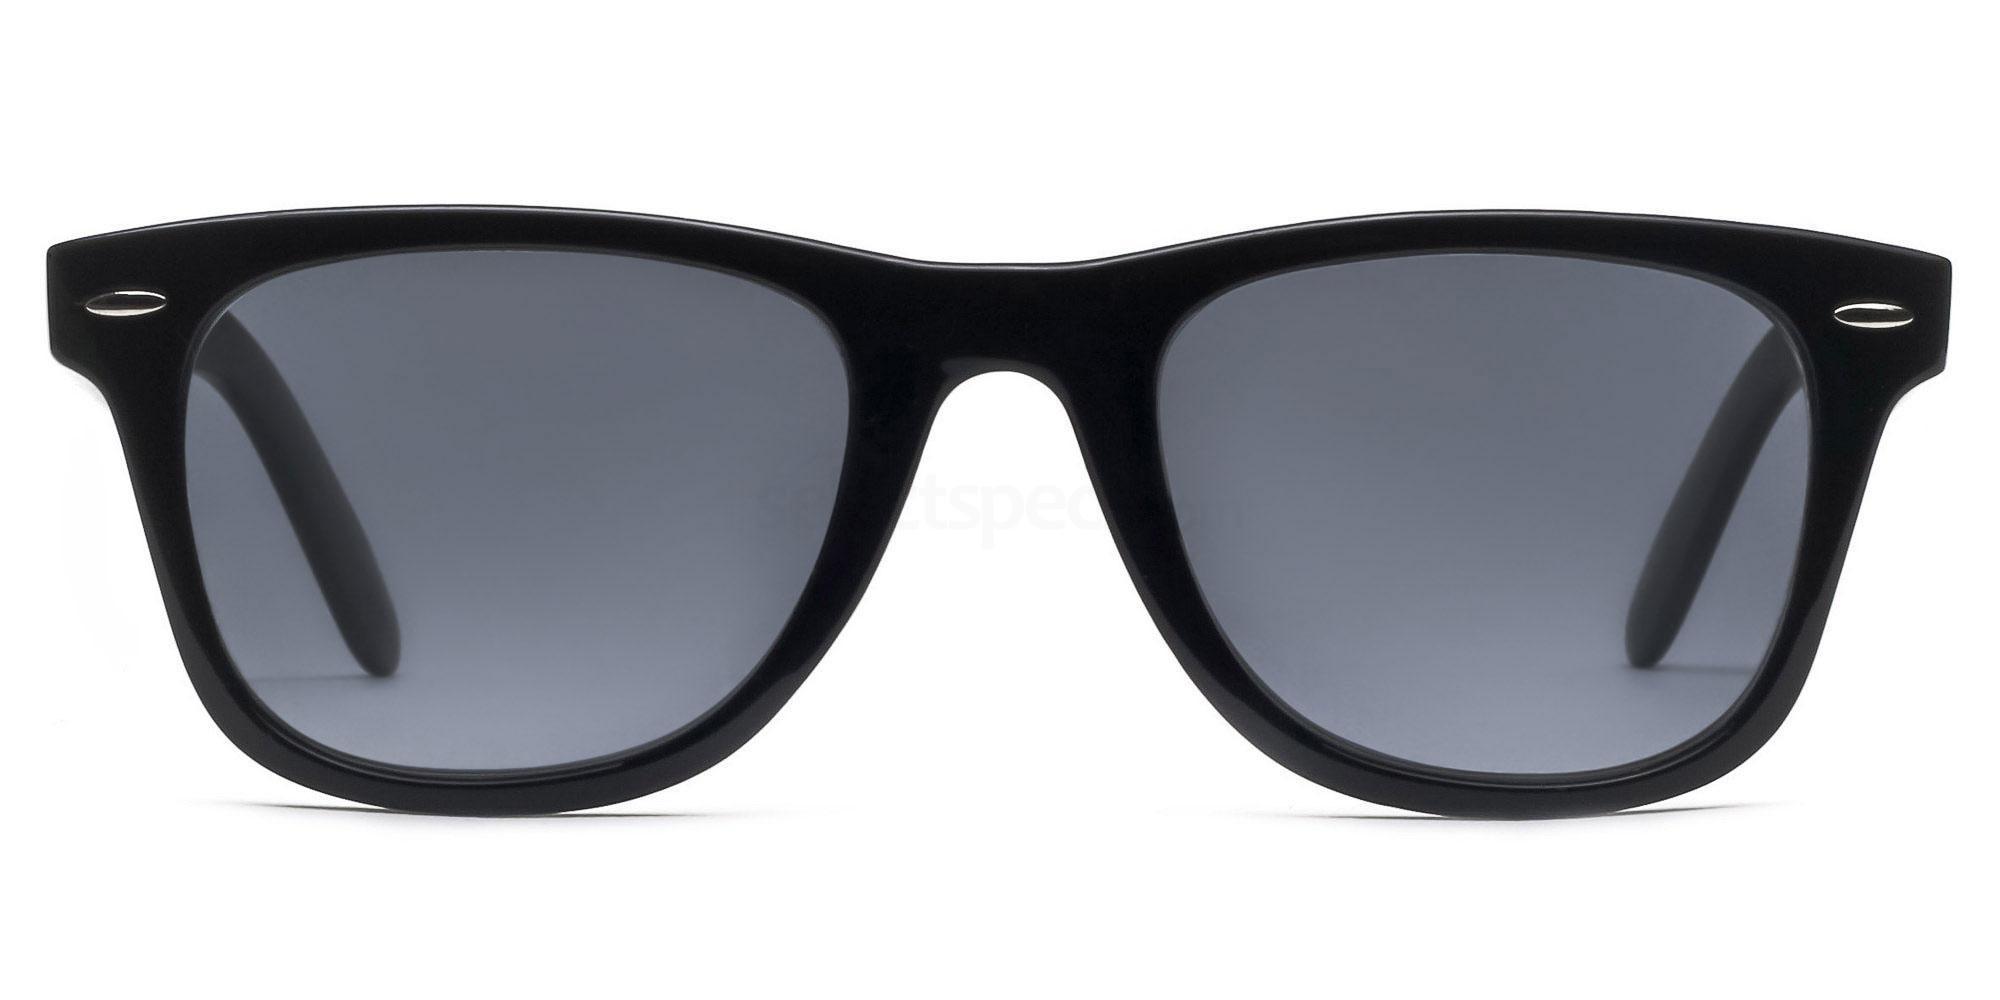 C01 Dark Grey P2429 - Black (Sunglasses) Sunglasses, Savannah